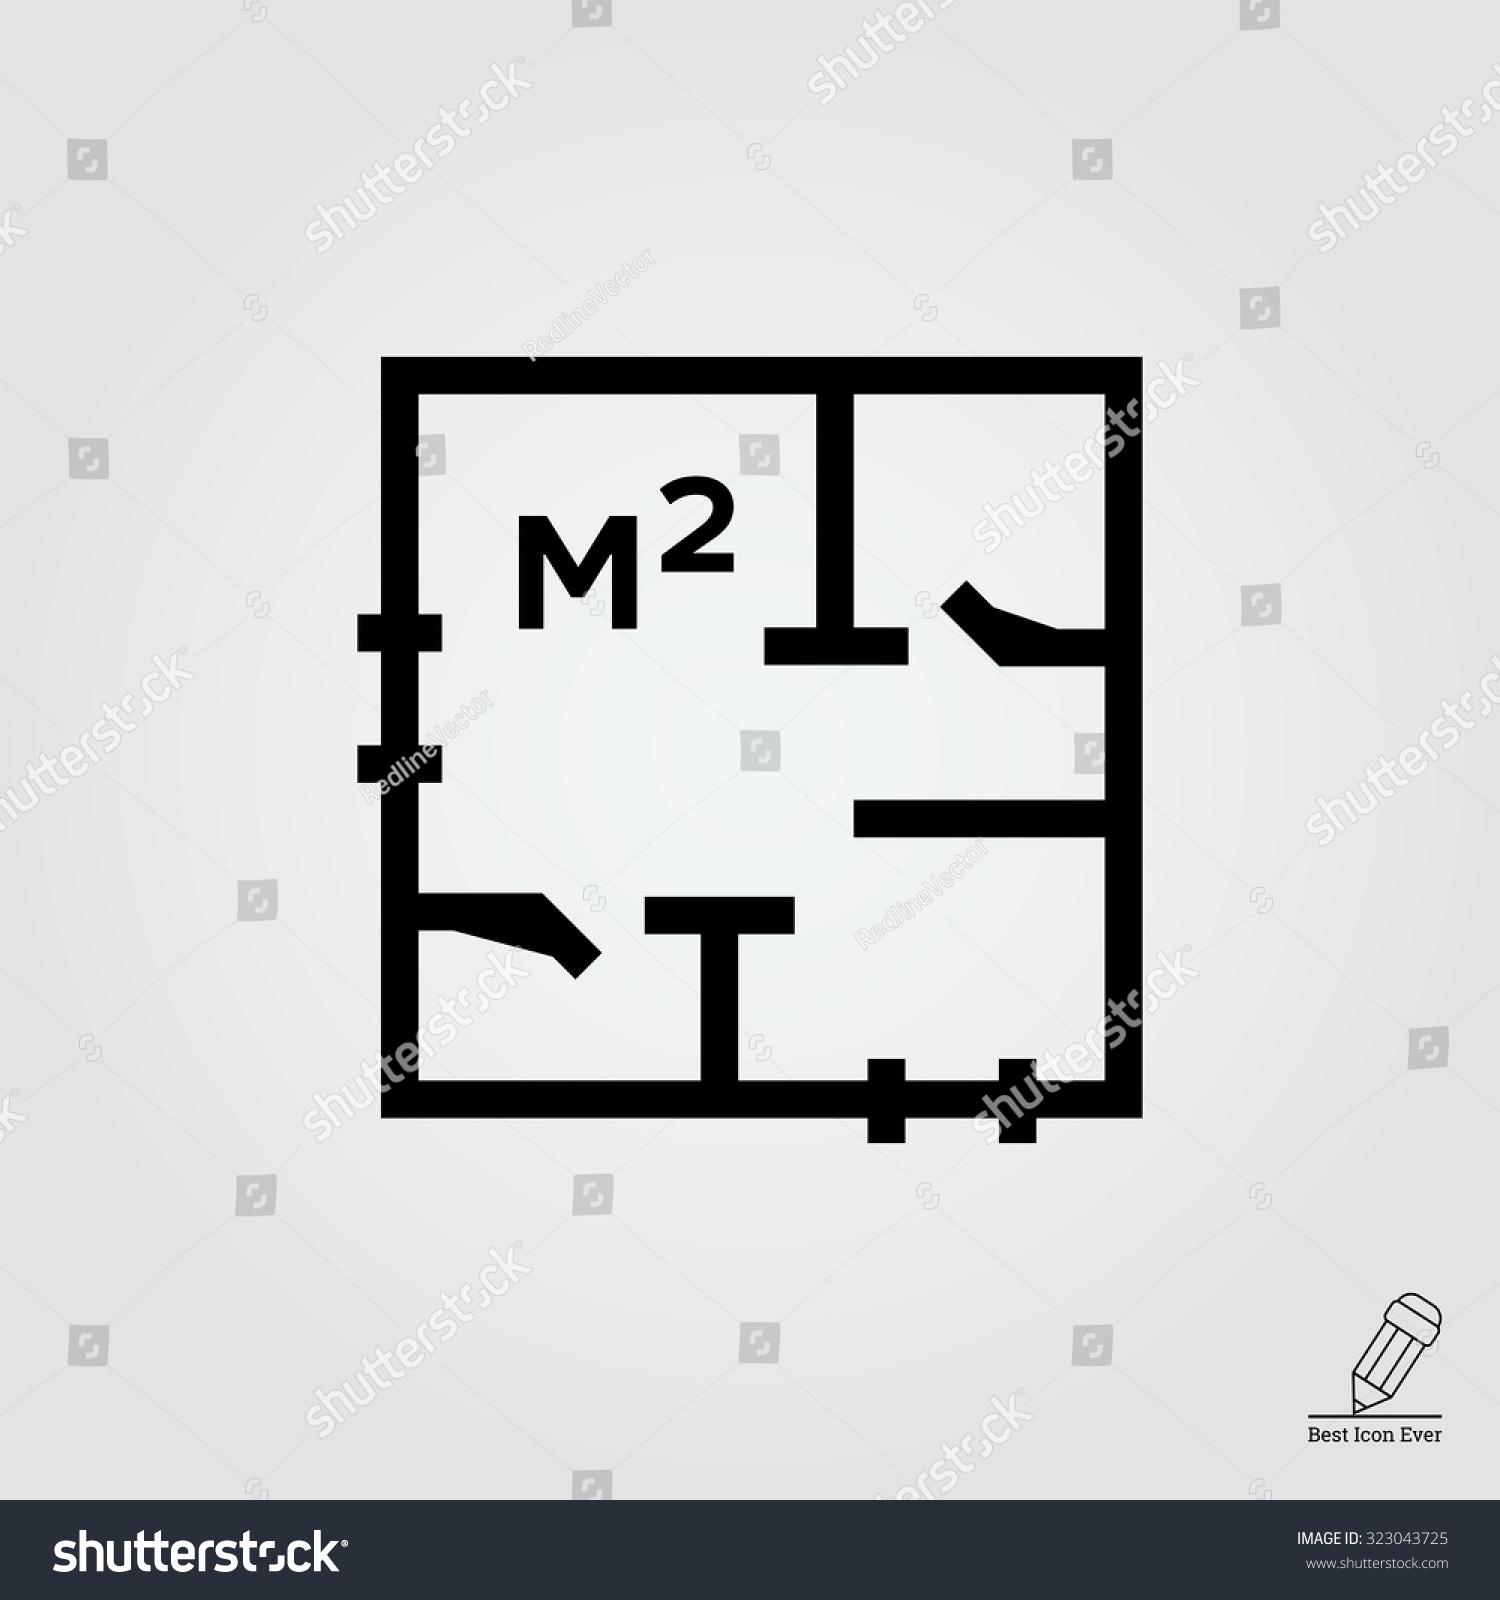 Icon Apartment Scheme Square Meter Designation Stock Vector Royalty